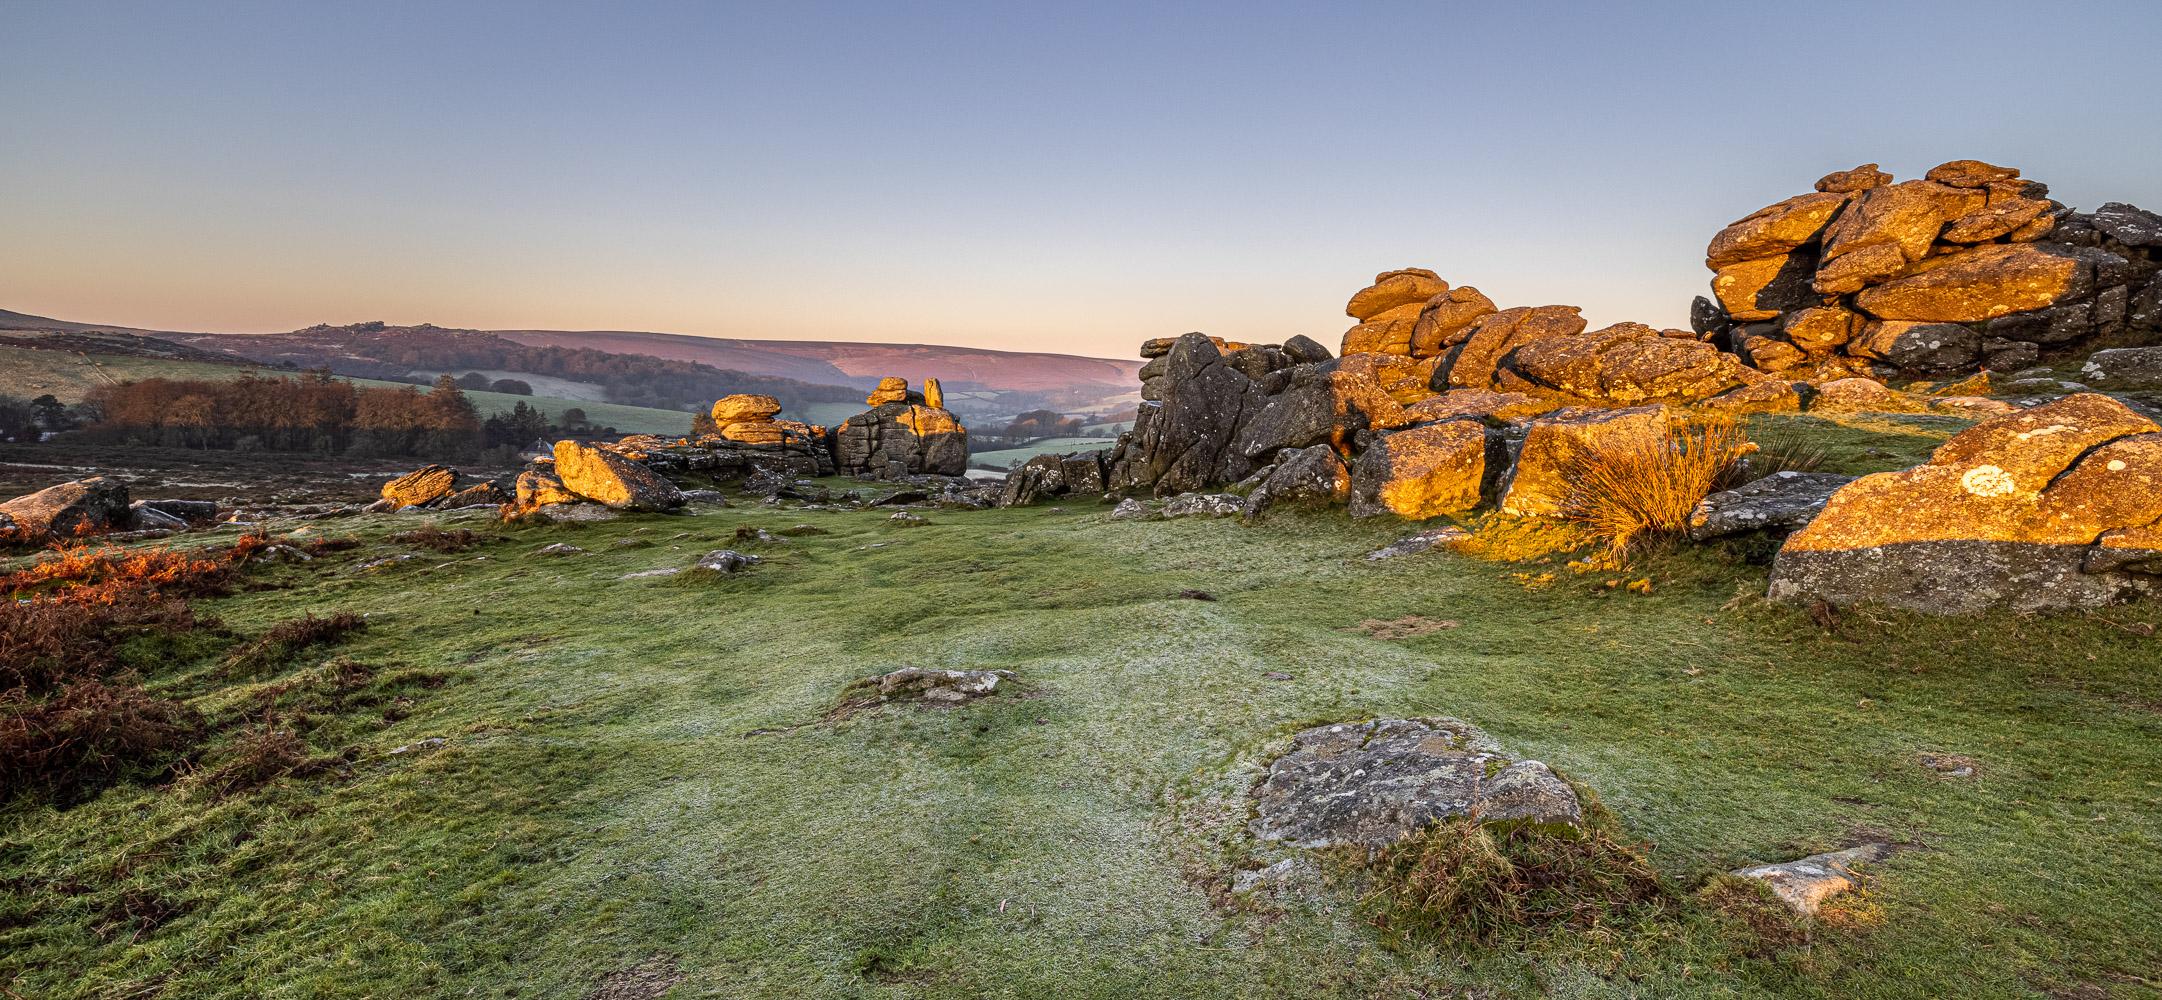 Hound Tor, Dartmoor, England